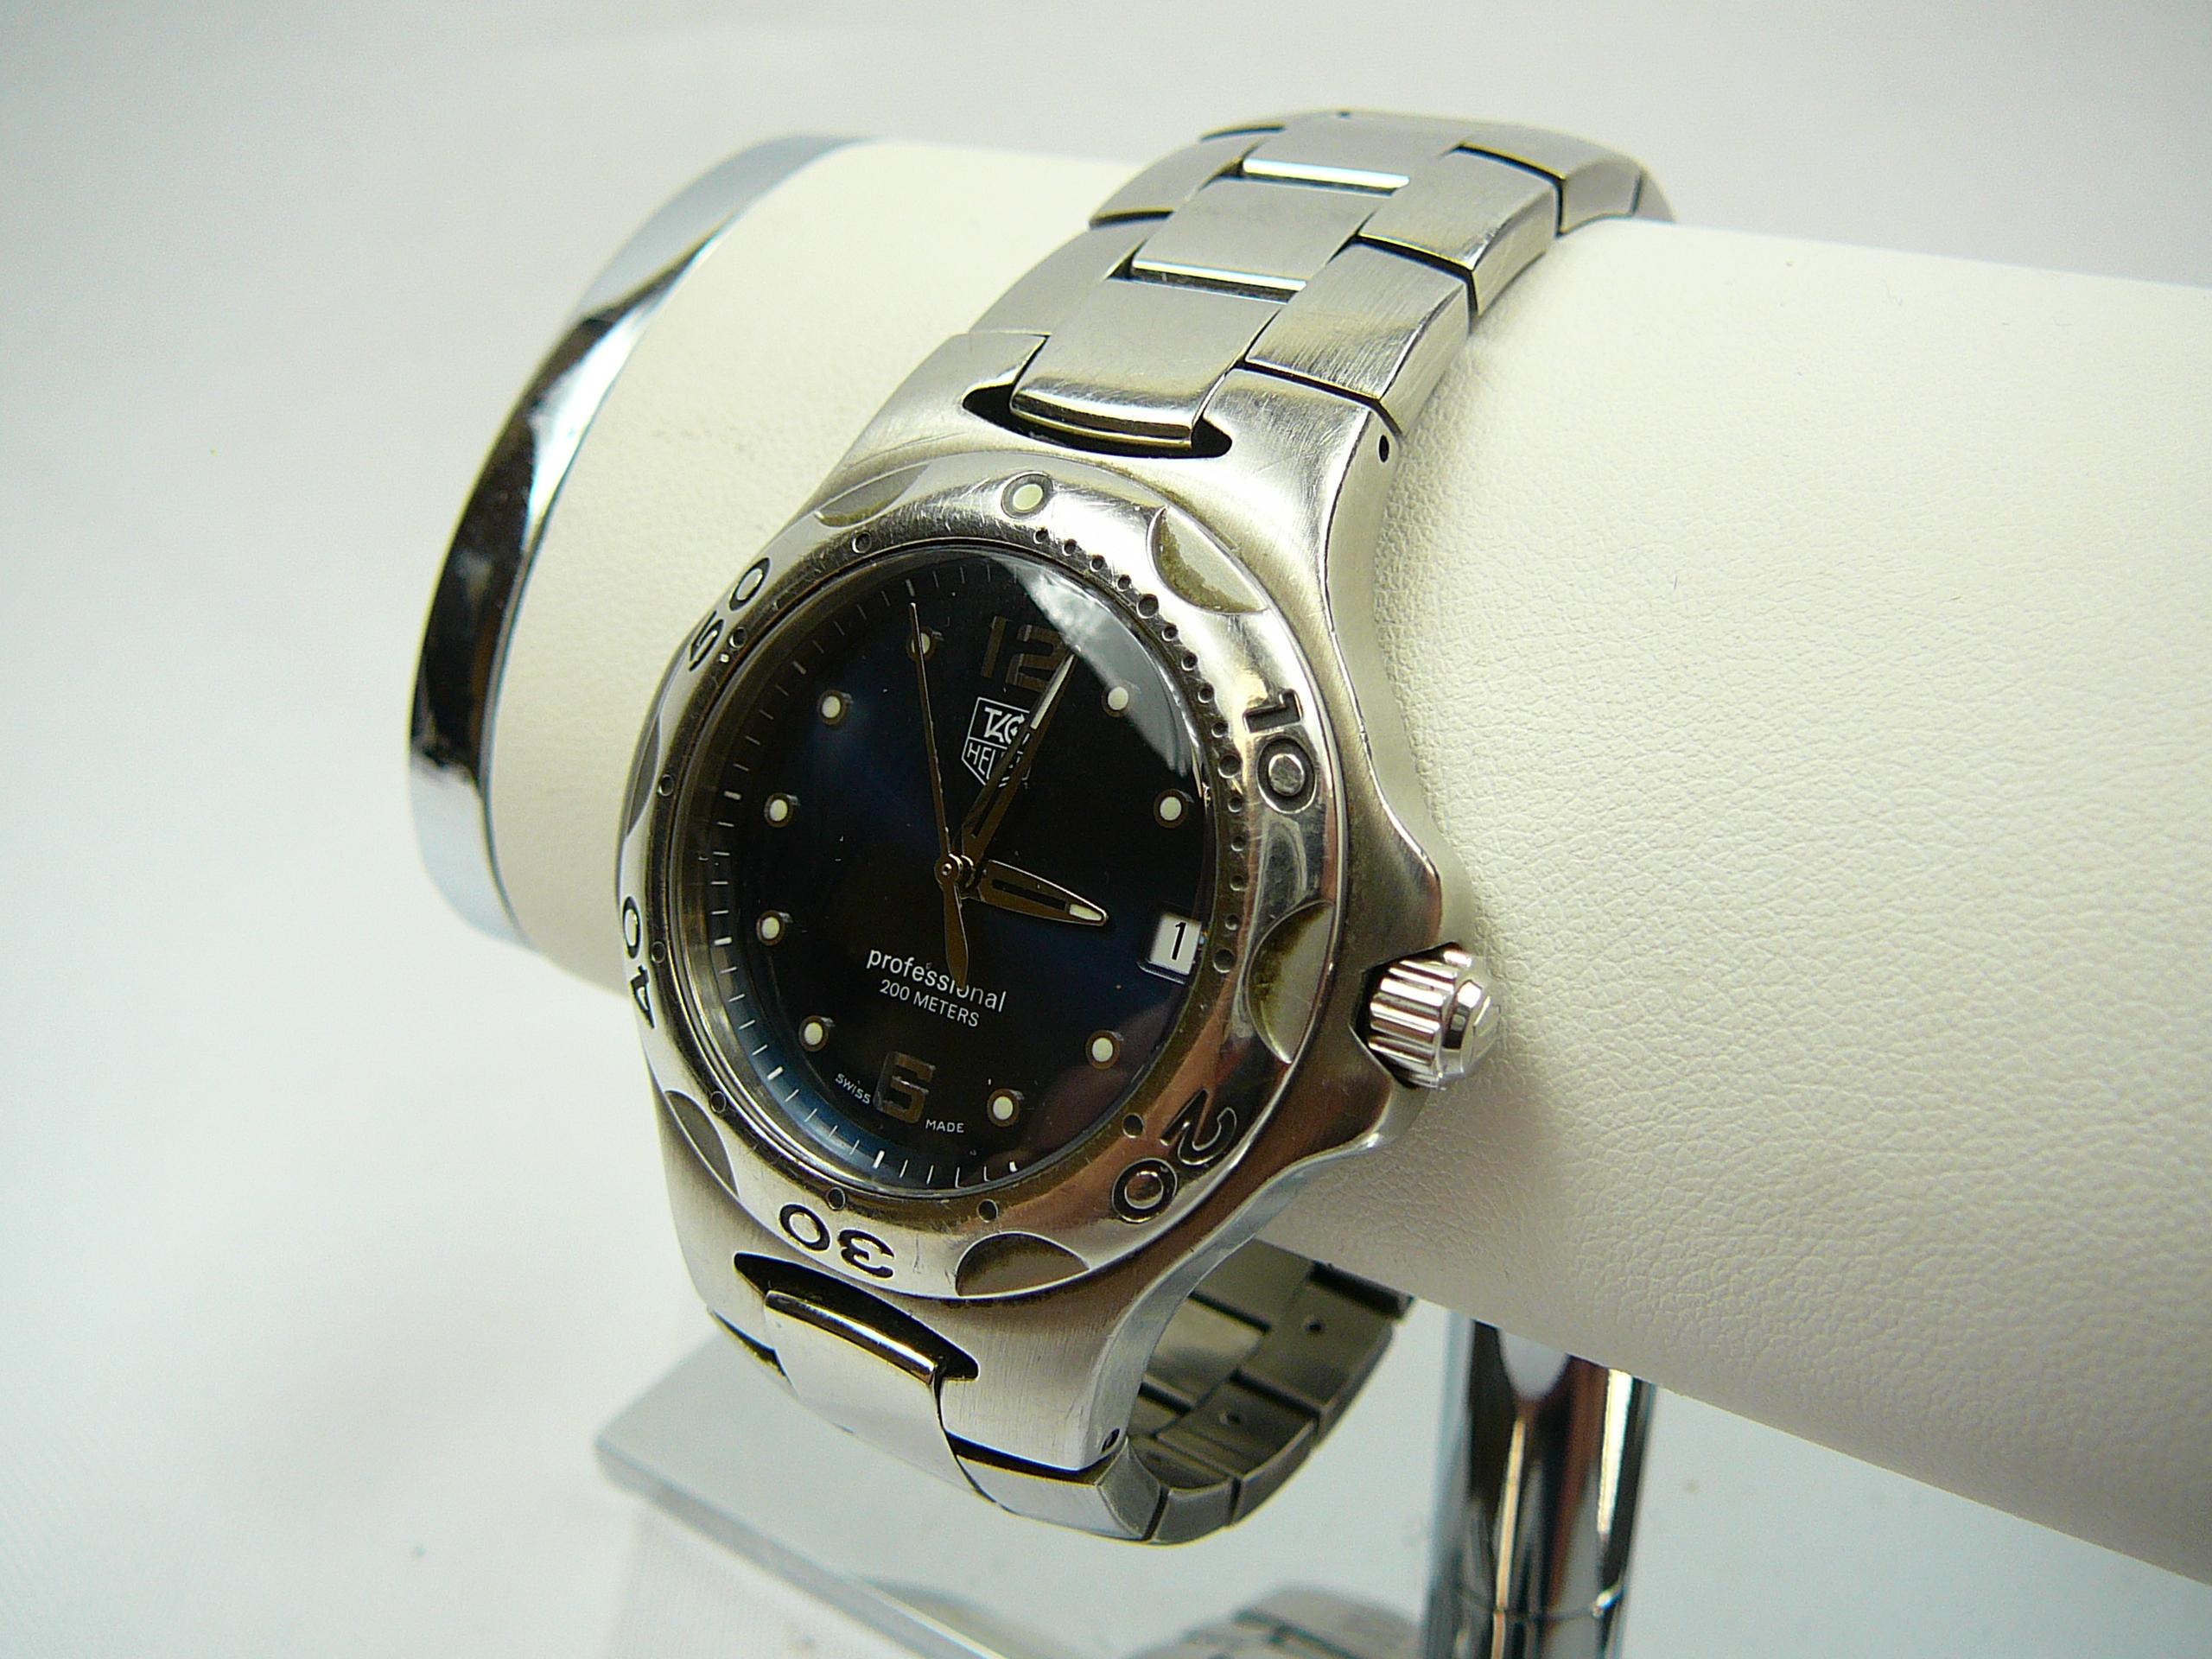 Lot 5 - Gents Tag Heuer wrist watch